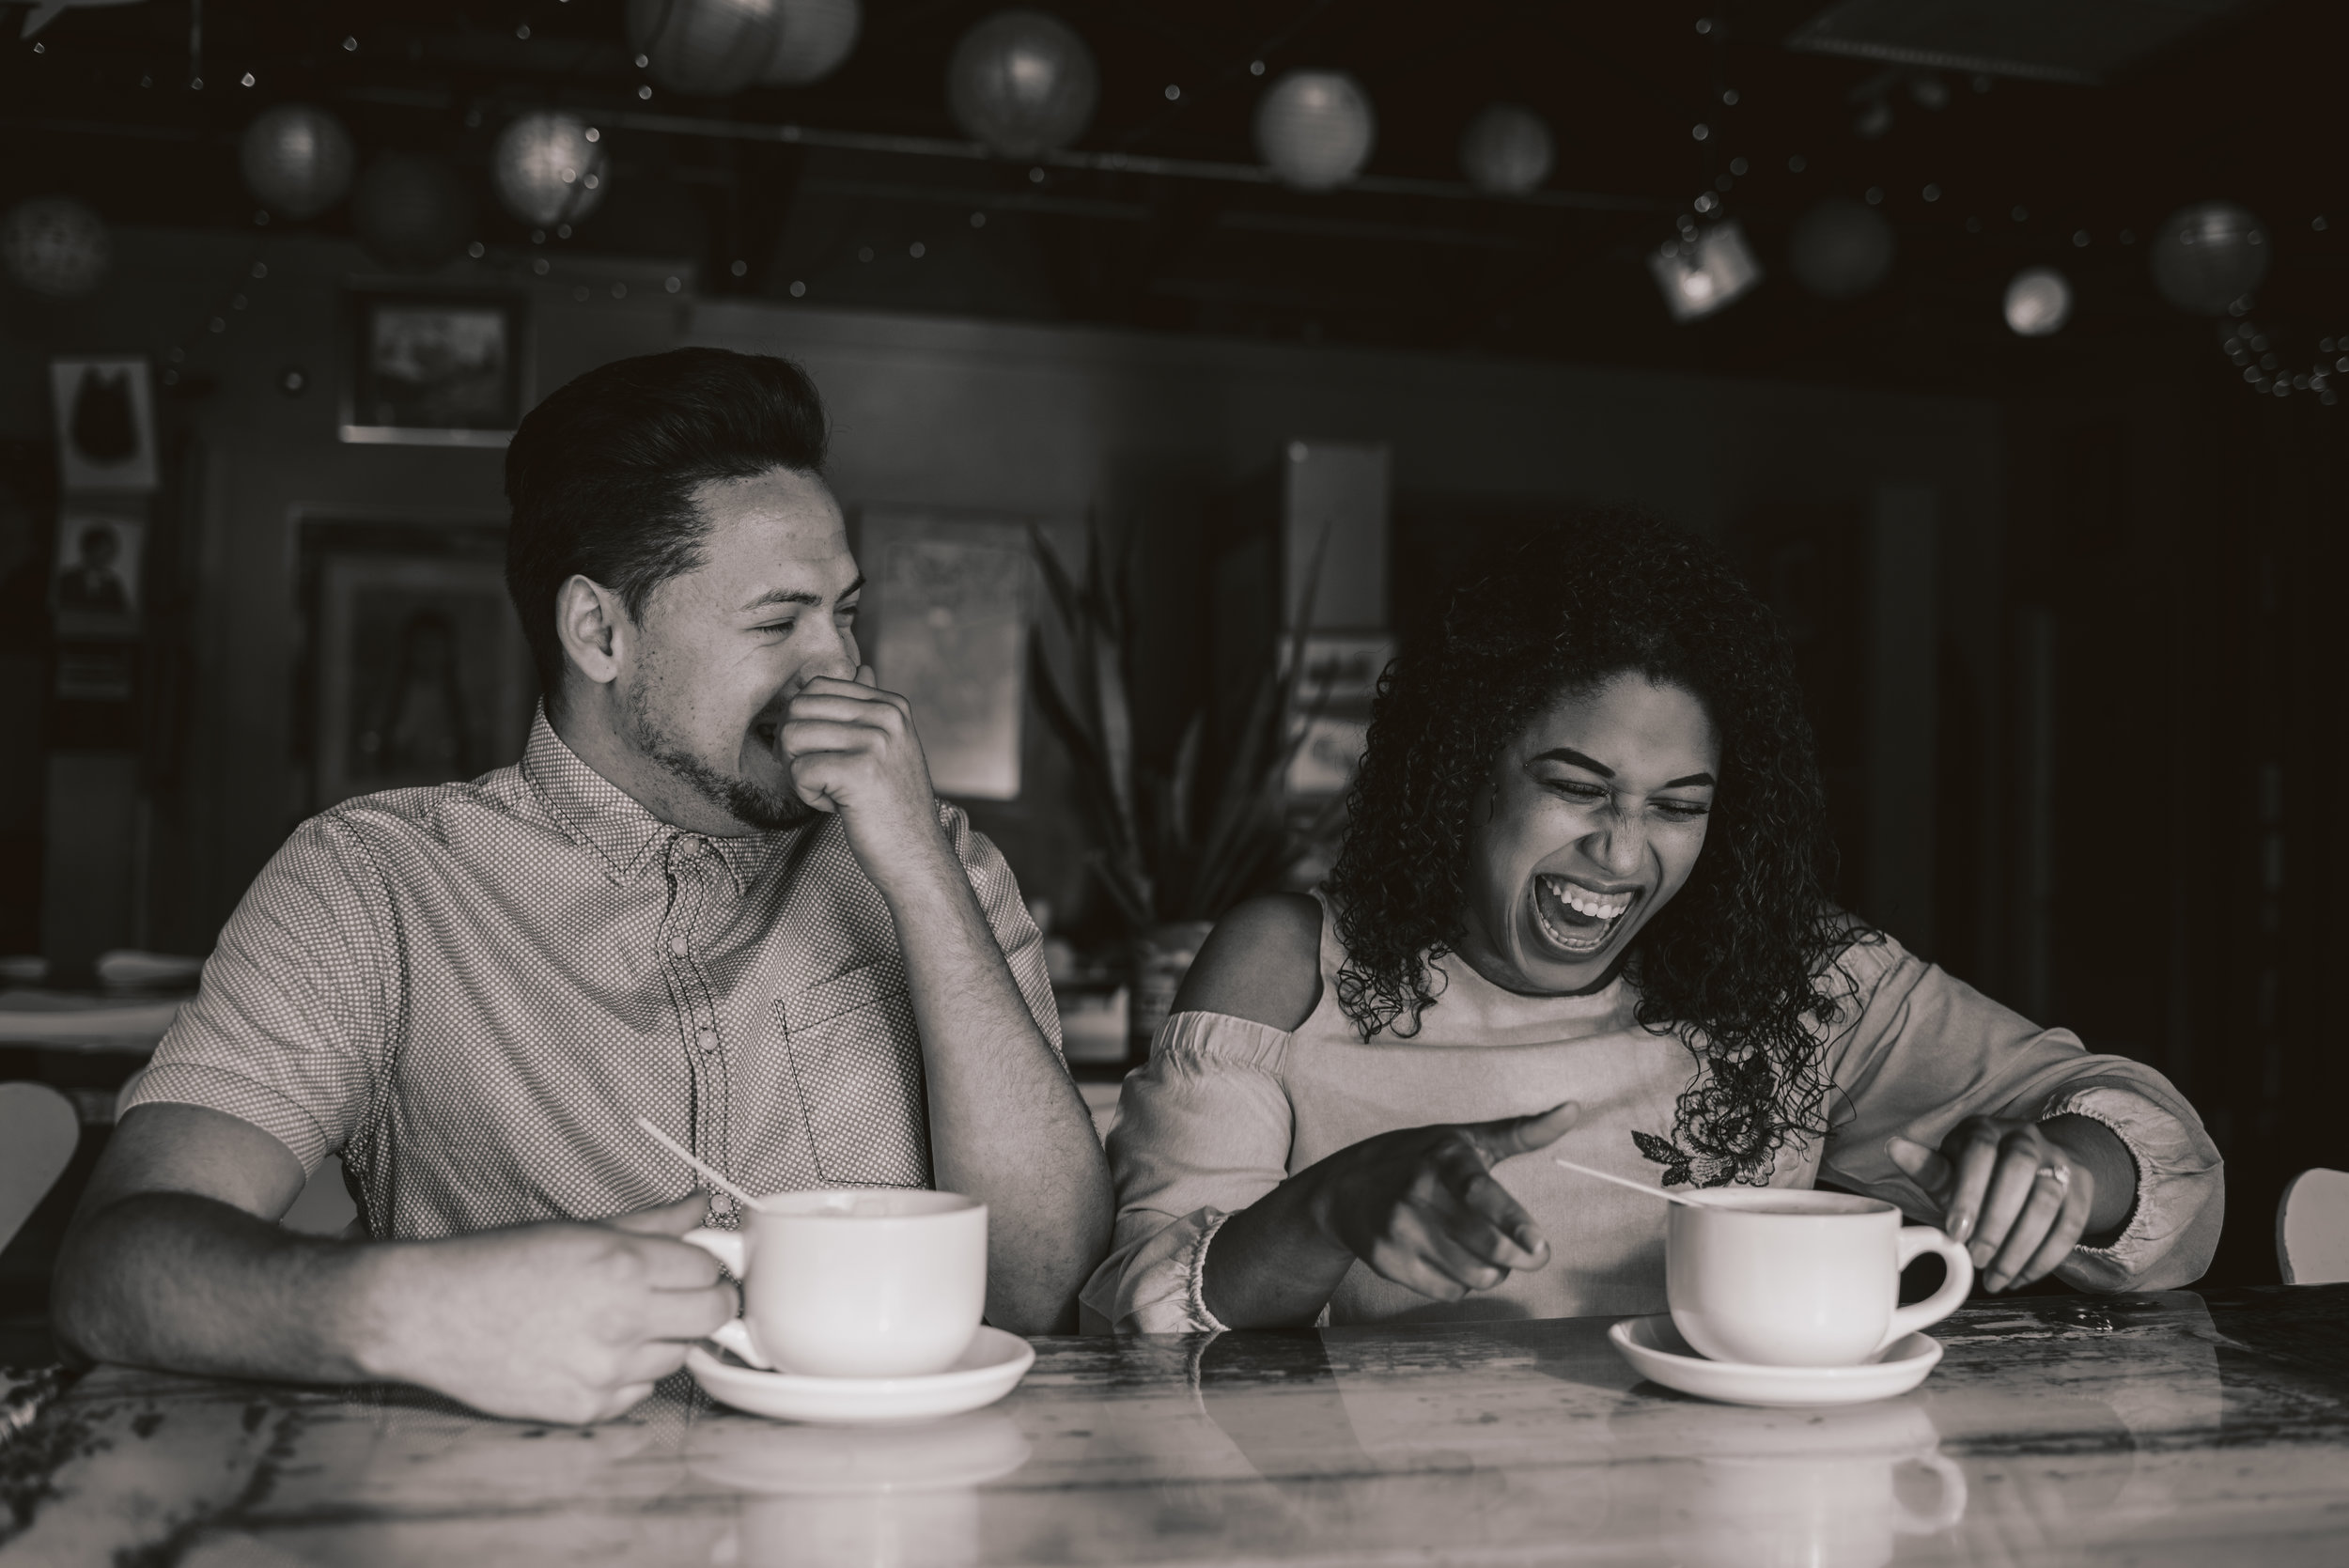 Los-Vargas-photo-coffee-shop-engagement-session-15.jpg